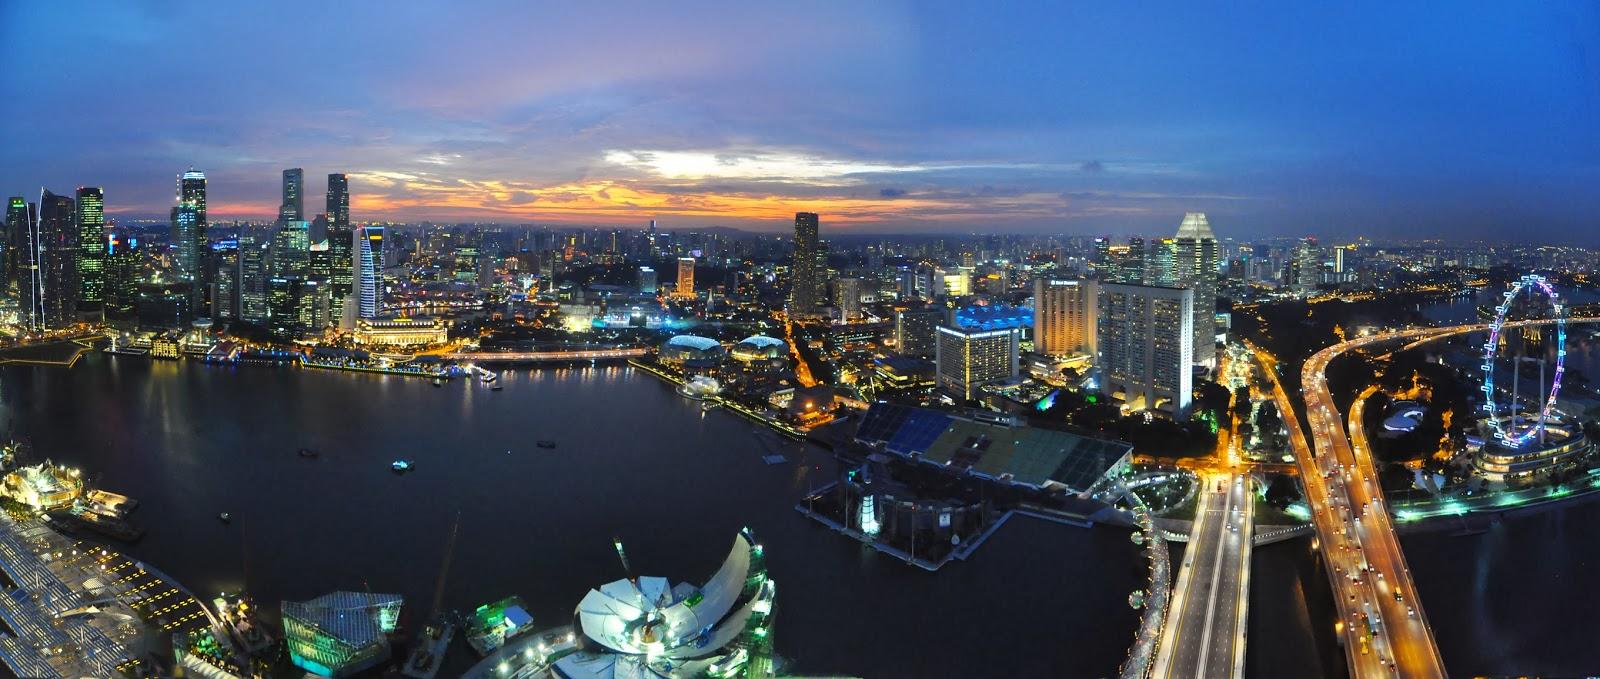 http://upload.wikimedia.org/wikipedia/commons/6/6c/1_Singapore_skyline.jpg